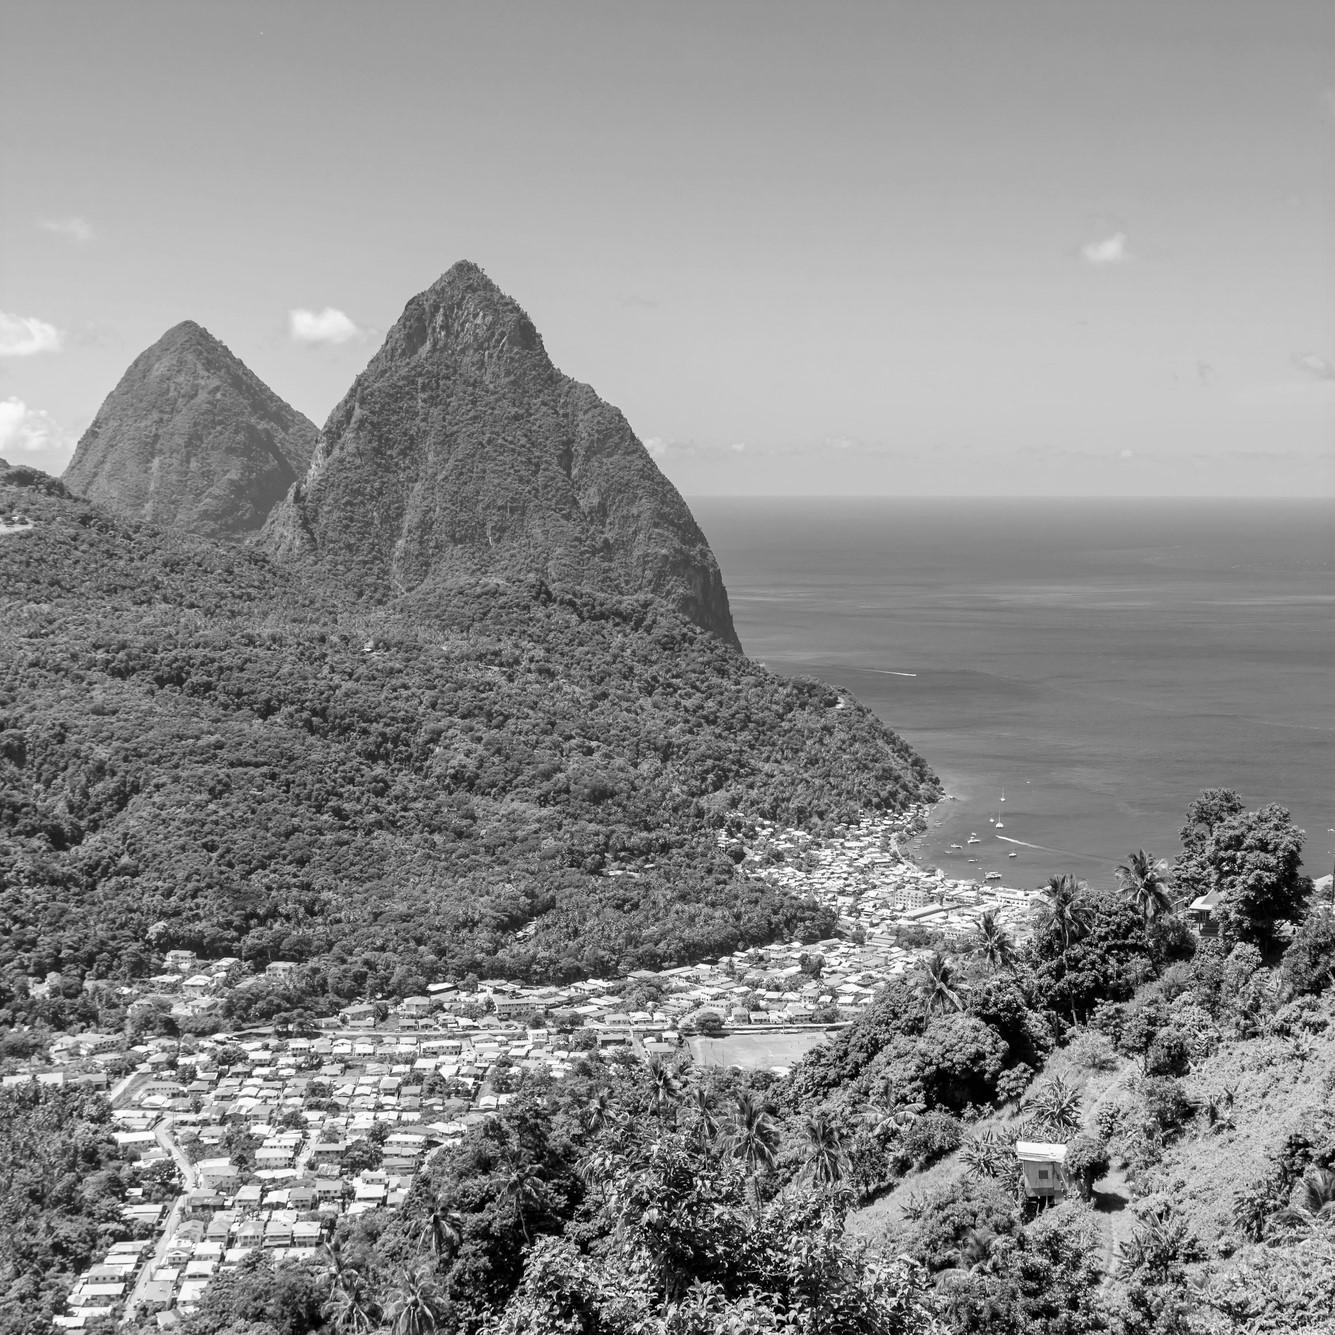 St Lucia Landscape BW